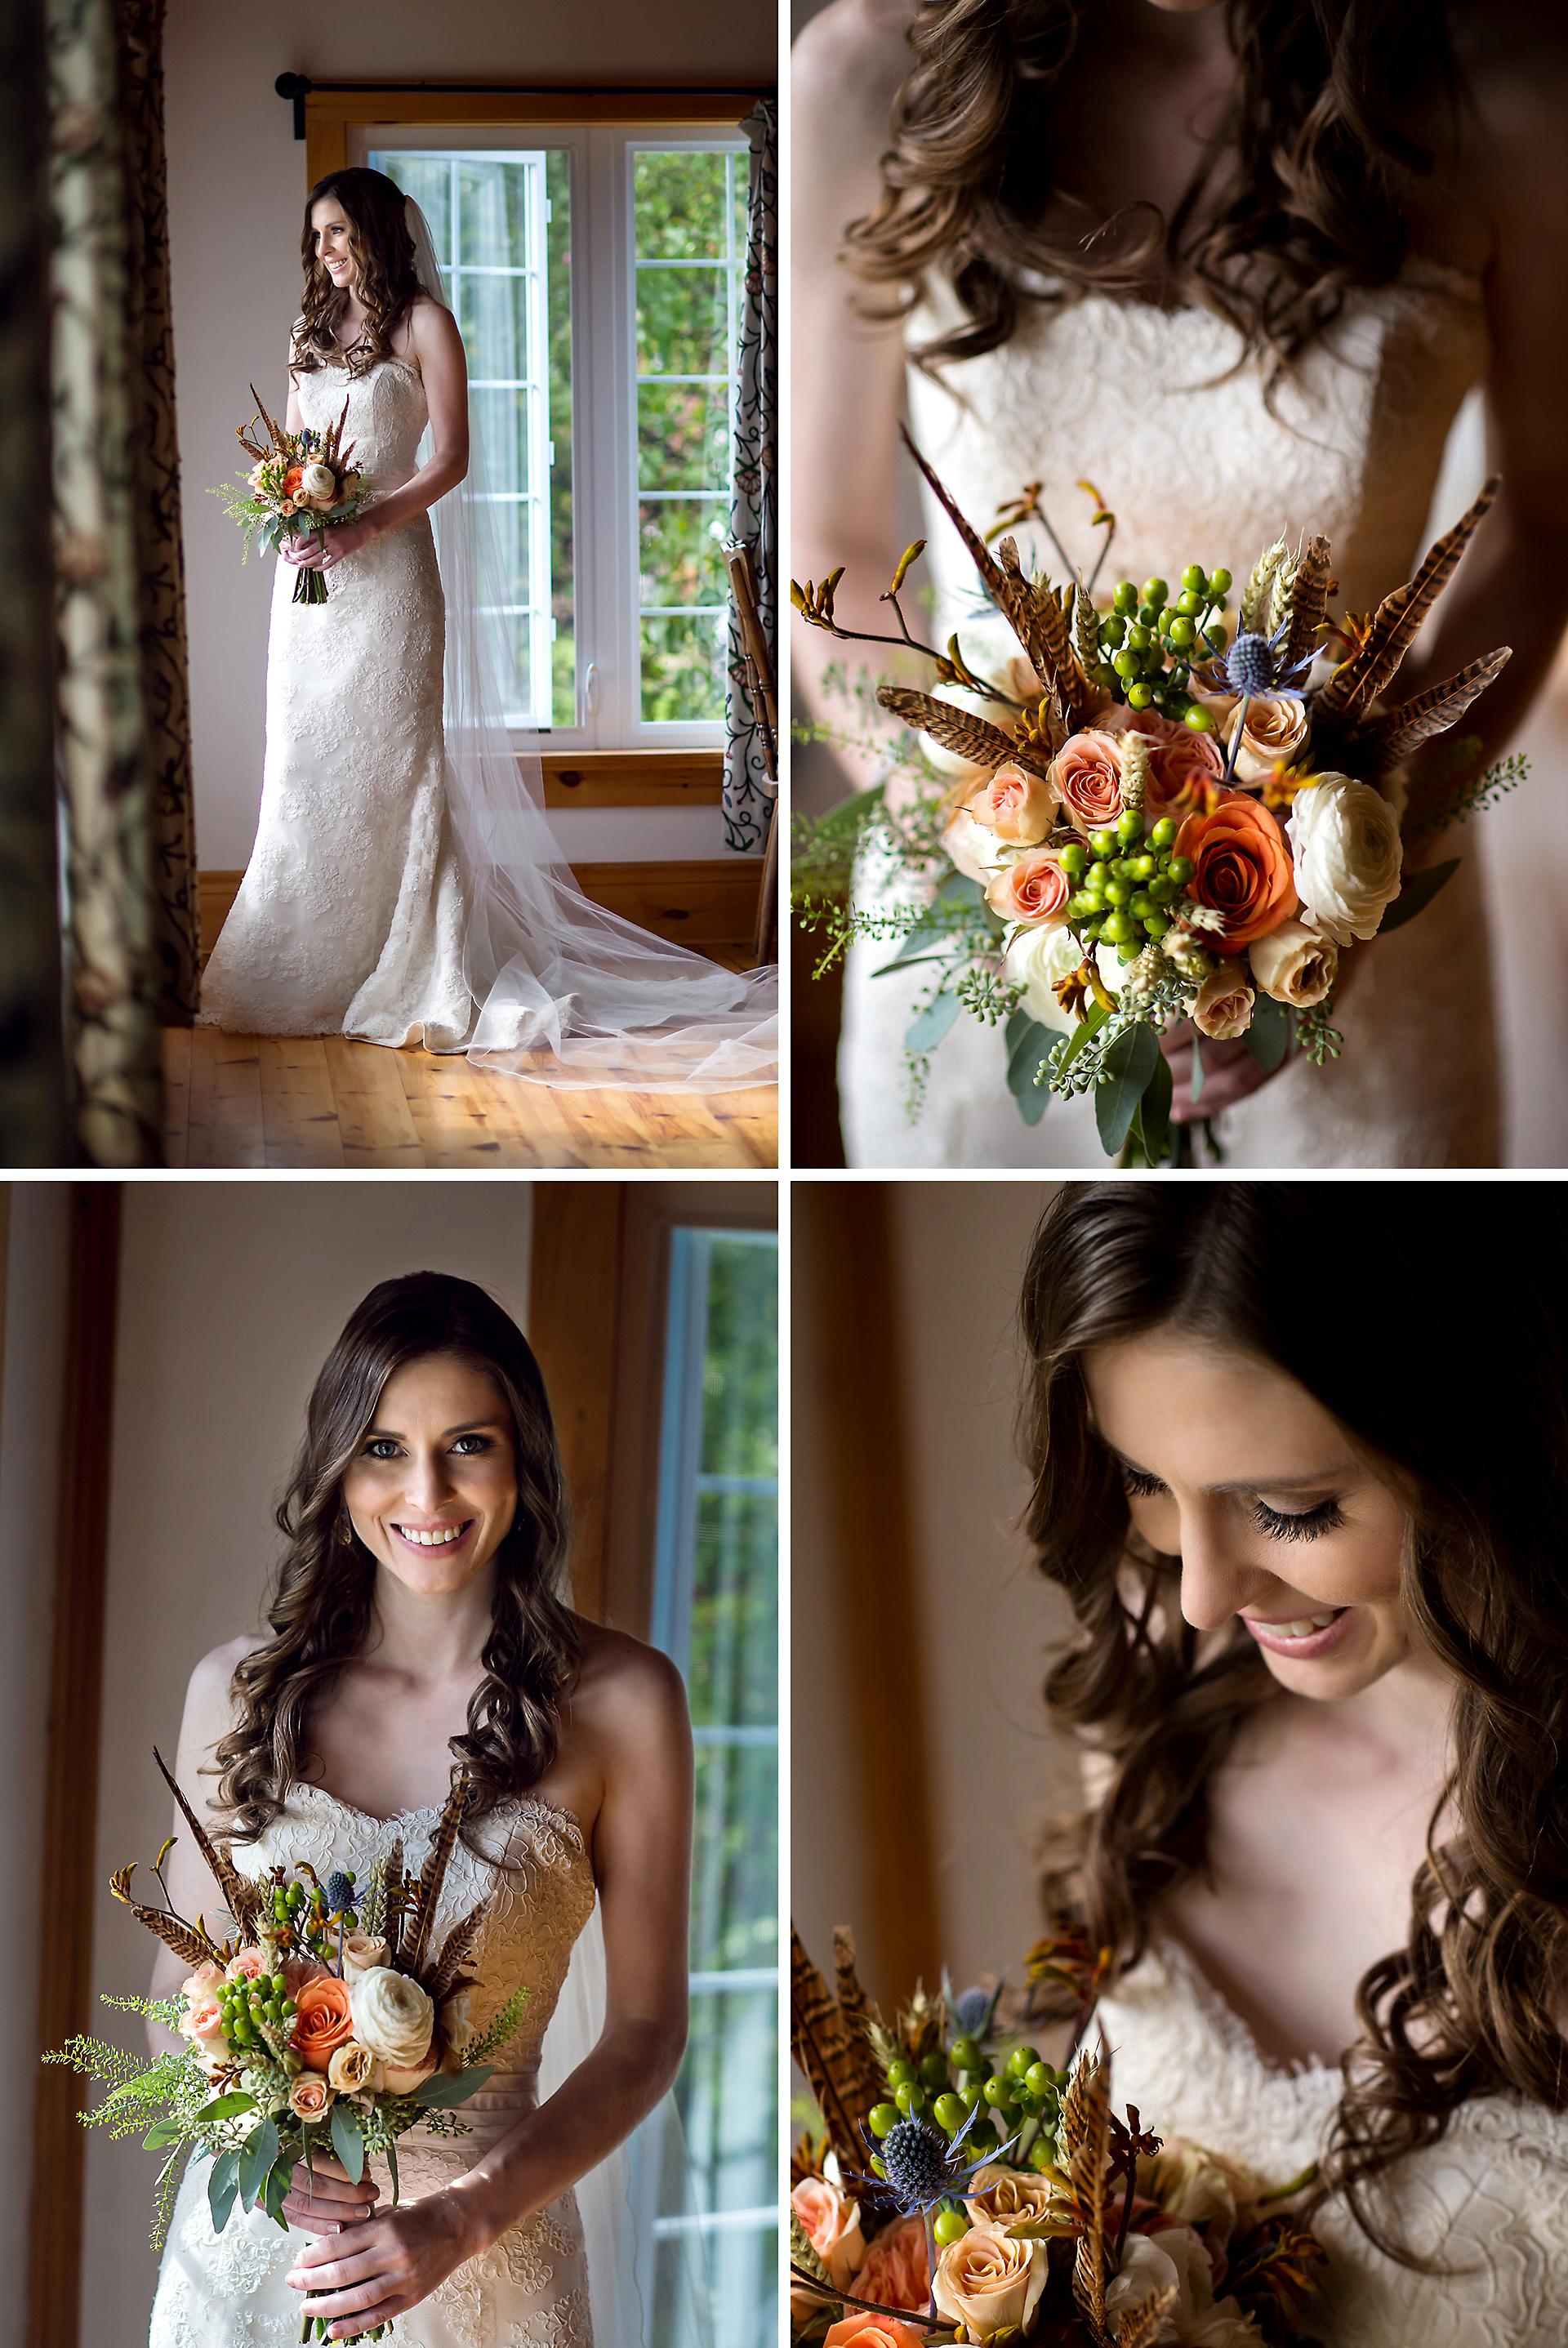 Nathan & Linda | Brooksfield Farms Wedding | Muskoka Wedding Photography08